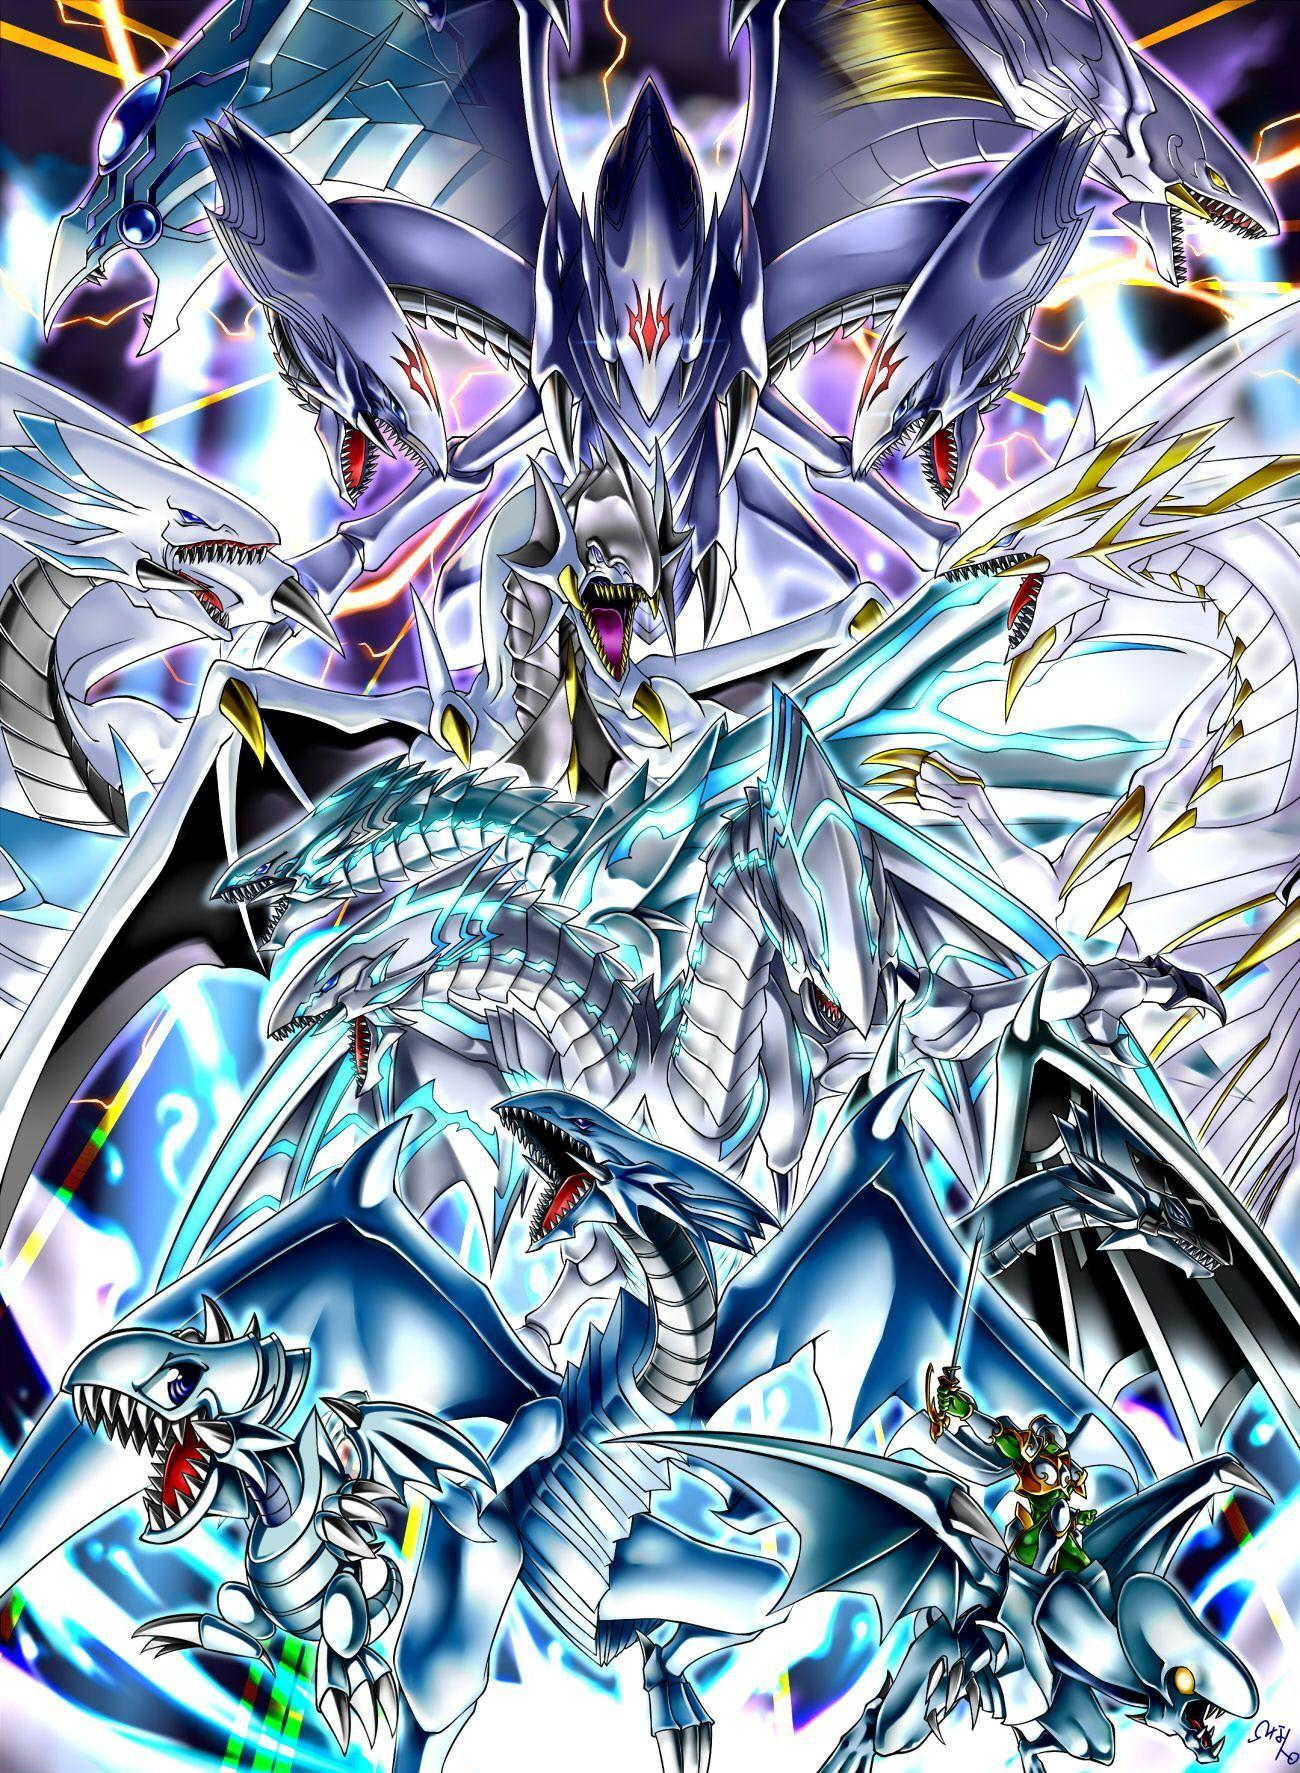 Yugioh Blue Eyes White Dragon Wallpapers - Wallpaper Cave